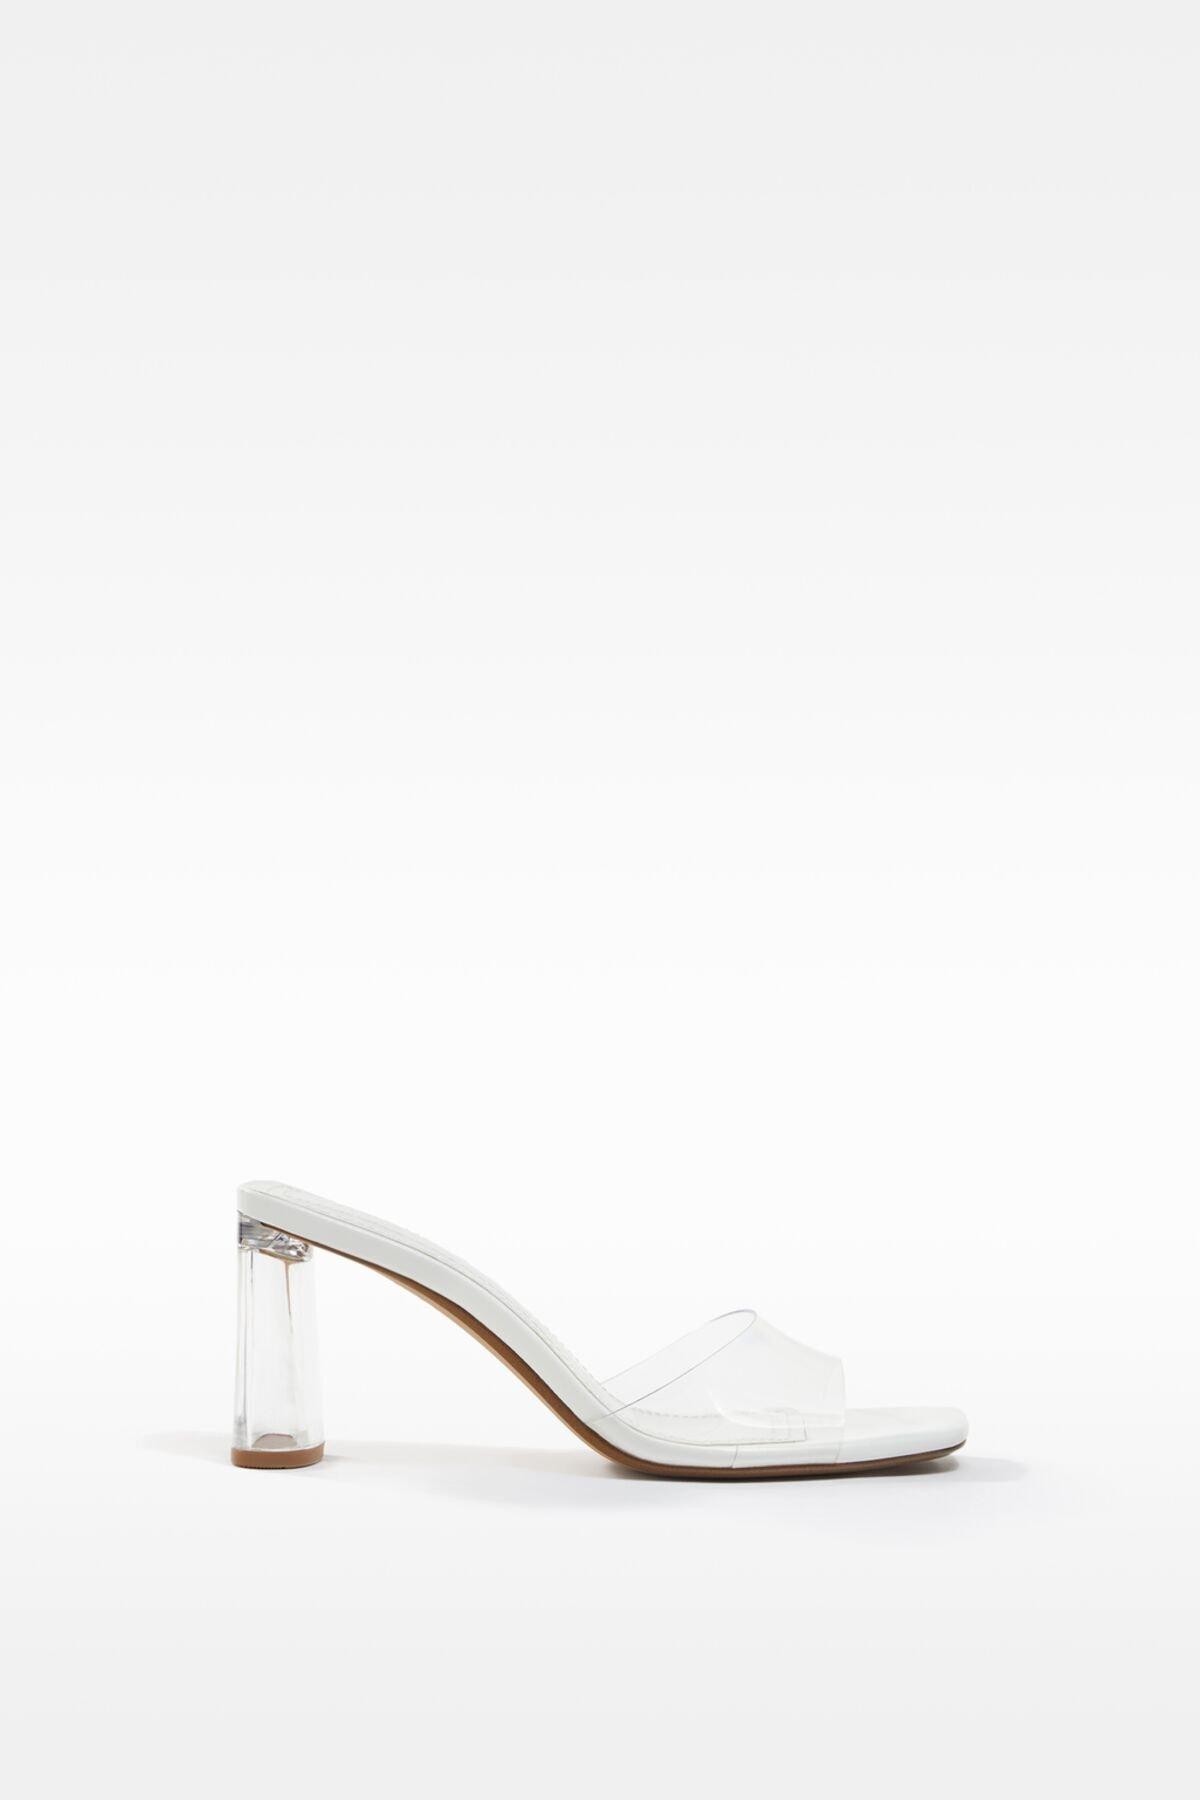 Bershka Kadın Transparan Metakrilat Topuklu Vinil Sandalet 11707760